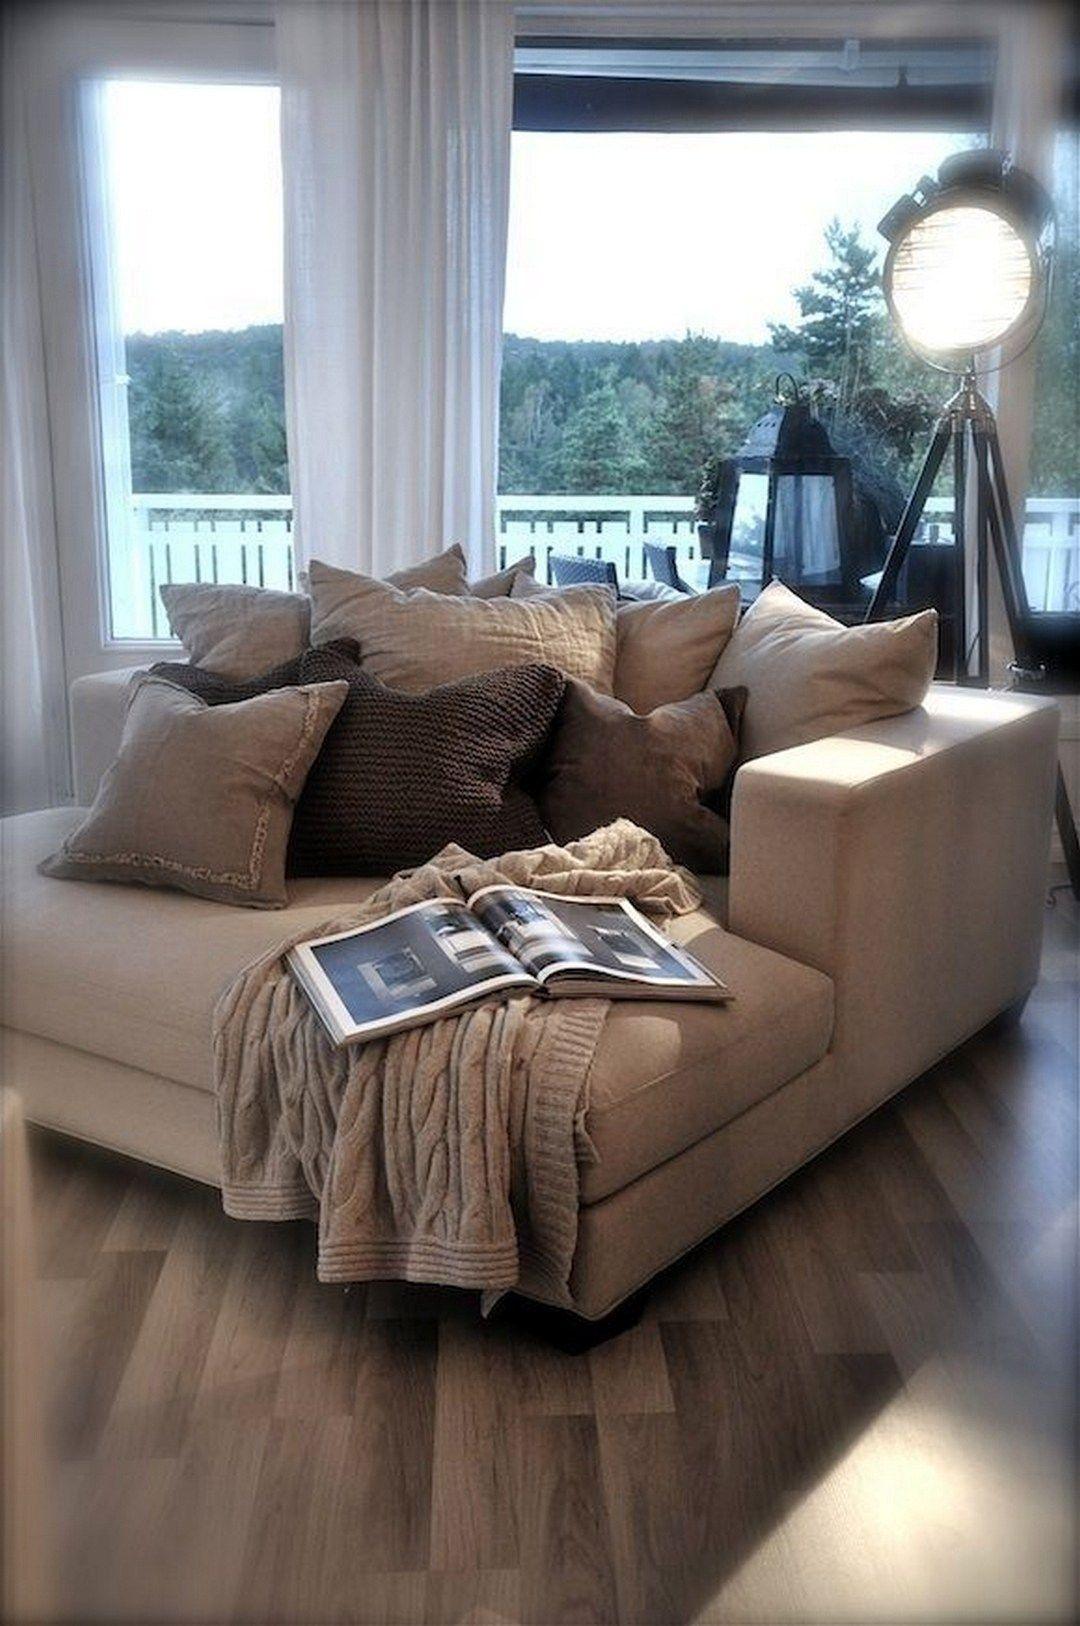 114 Cozy Reading Room Interior Ideas | Pinterest | Cozy reading ...